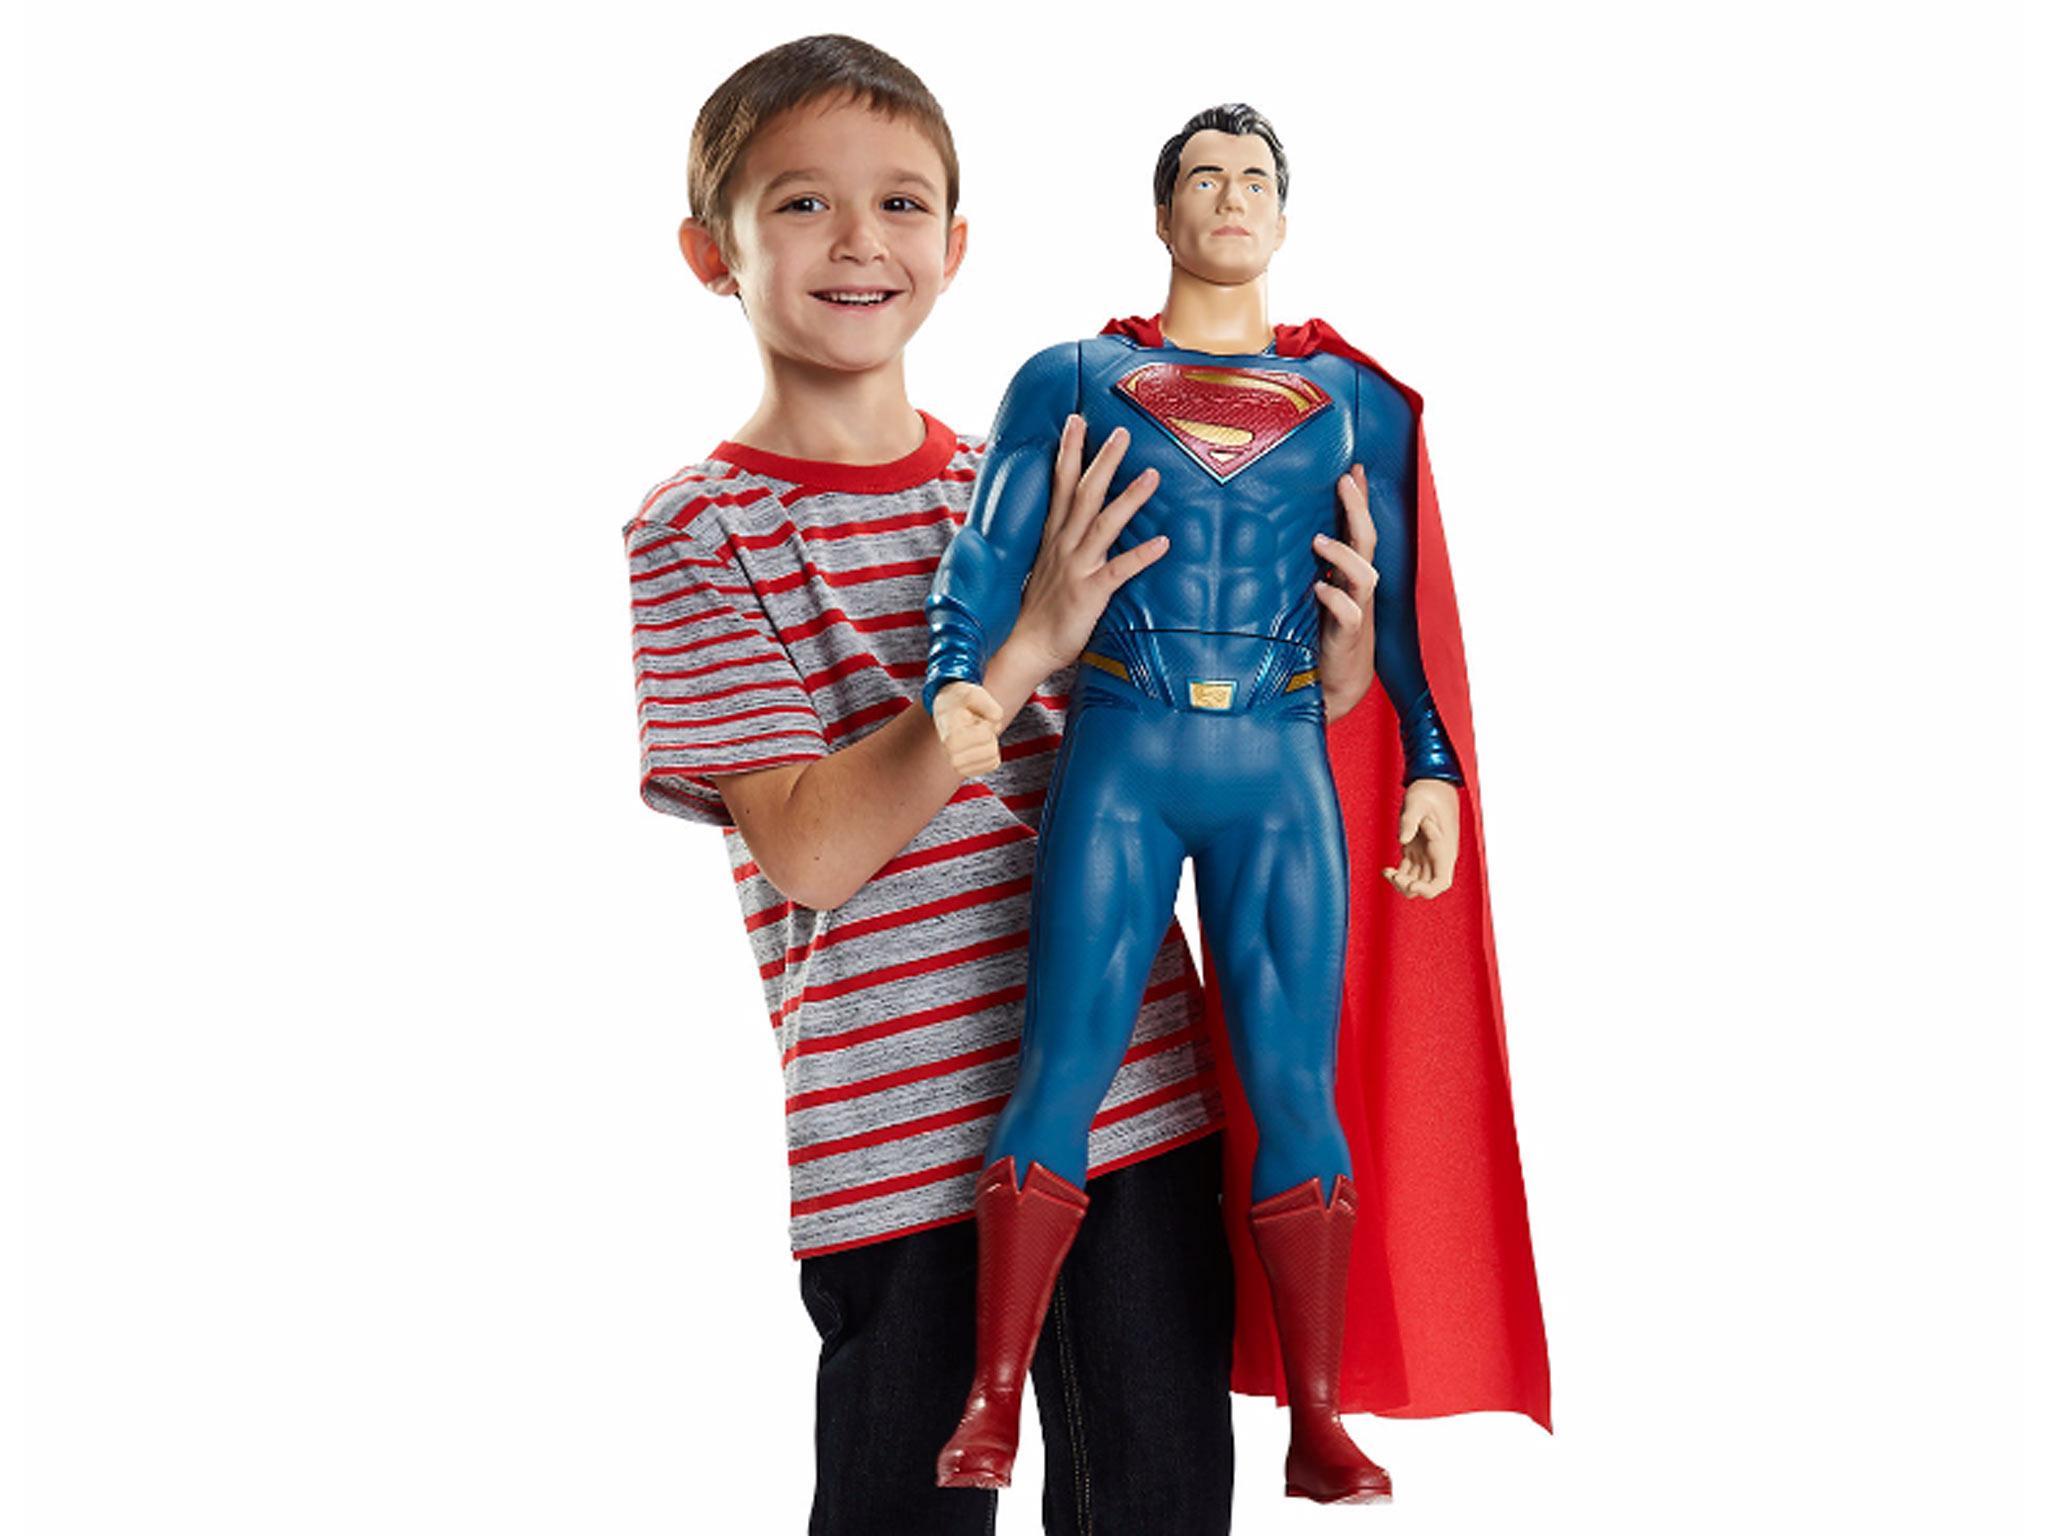 Kids Toys Action Figure: 11 Best Action Figures